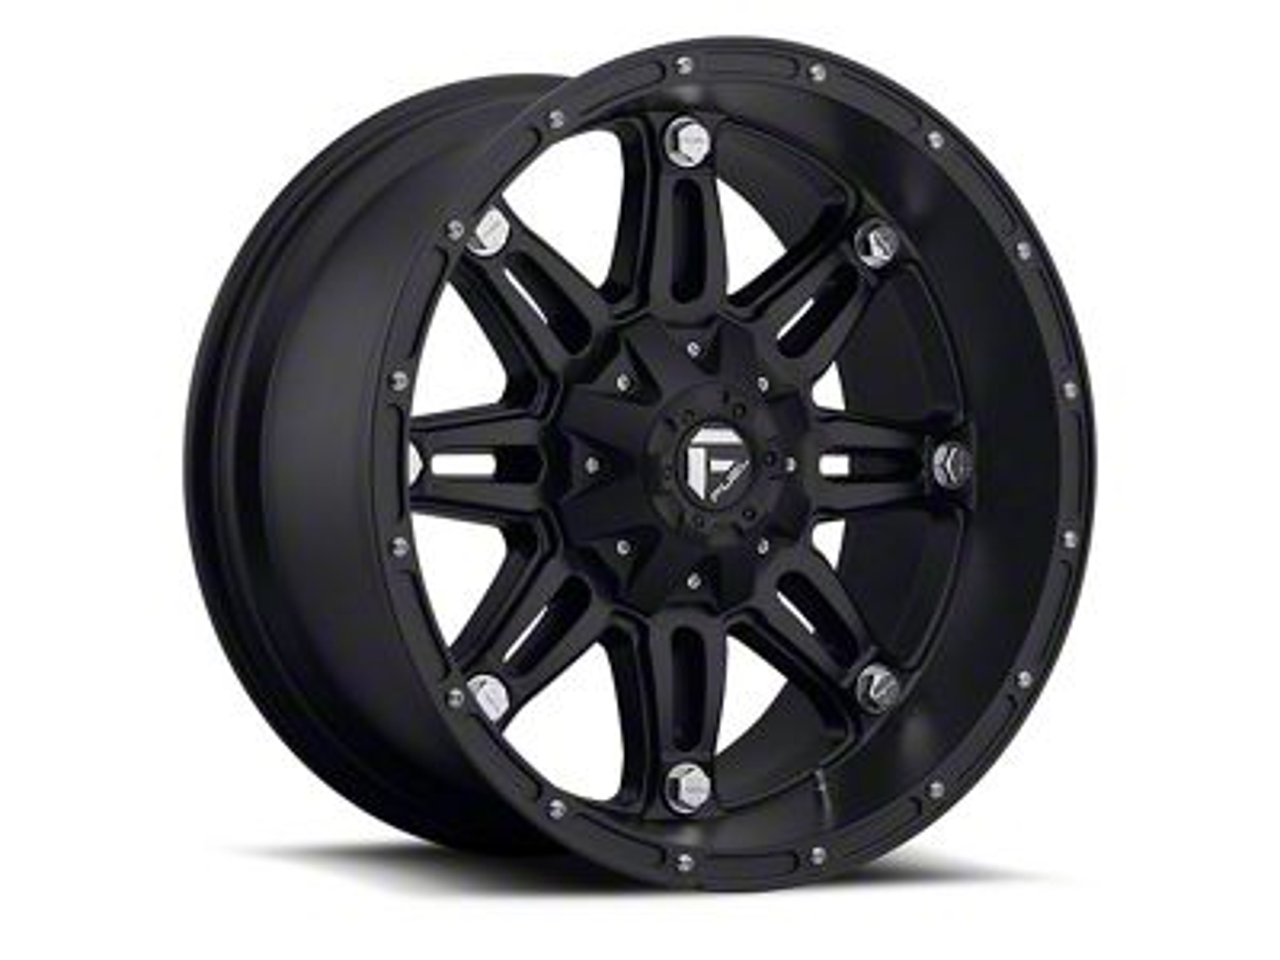 Fuel Wheels Hostage Matte Black 6-Lug Wheel - 20x12 (99-18 Silverado 1500)